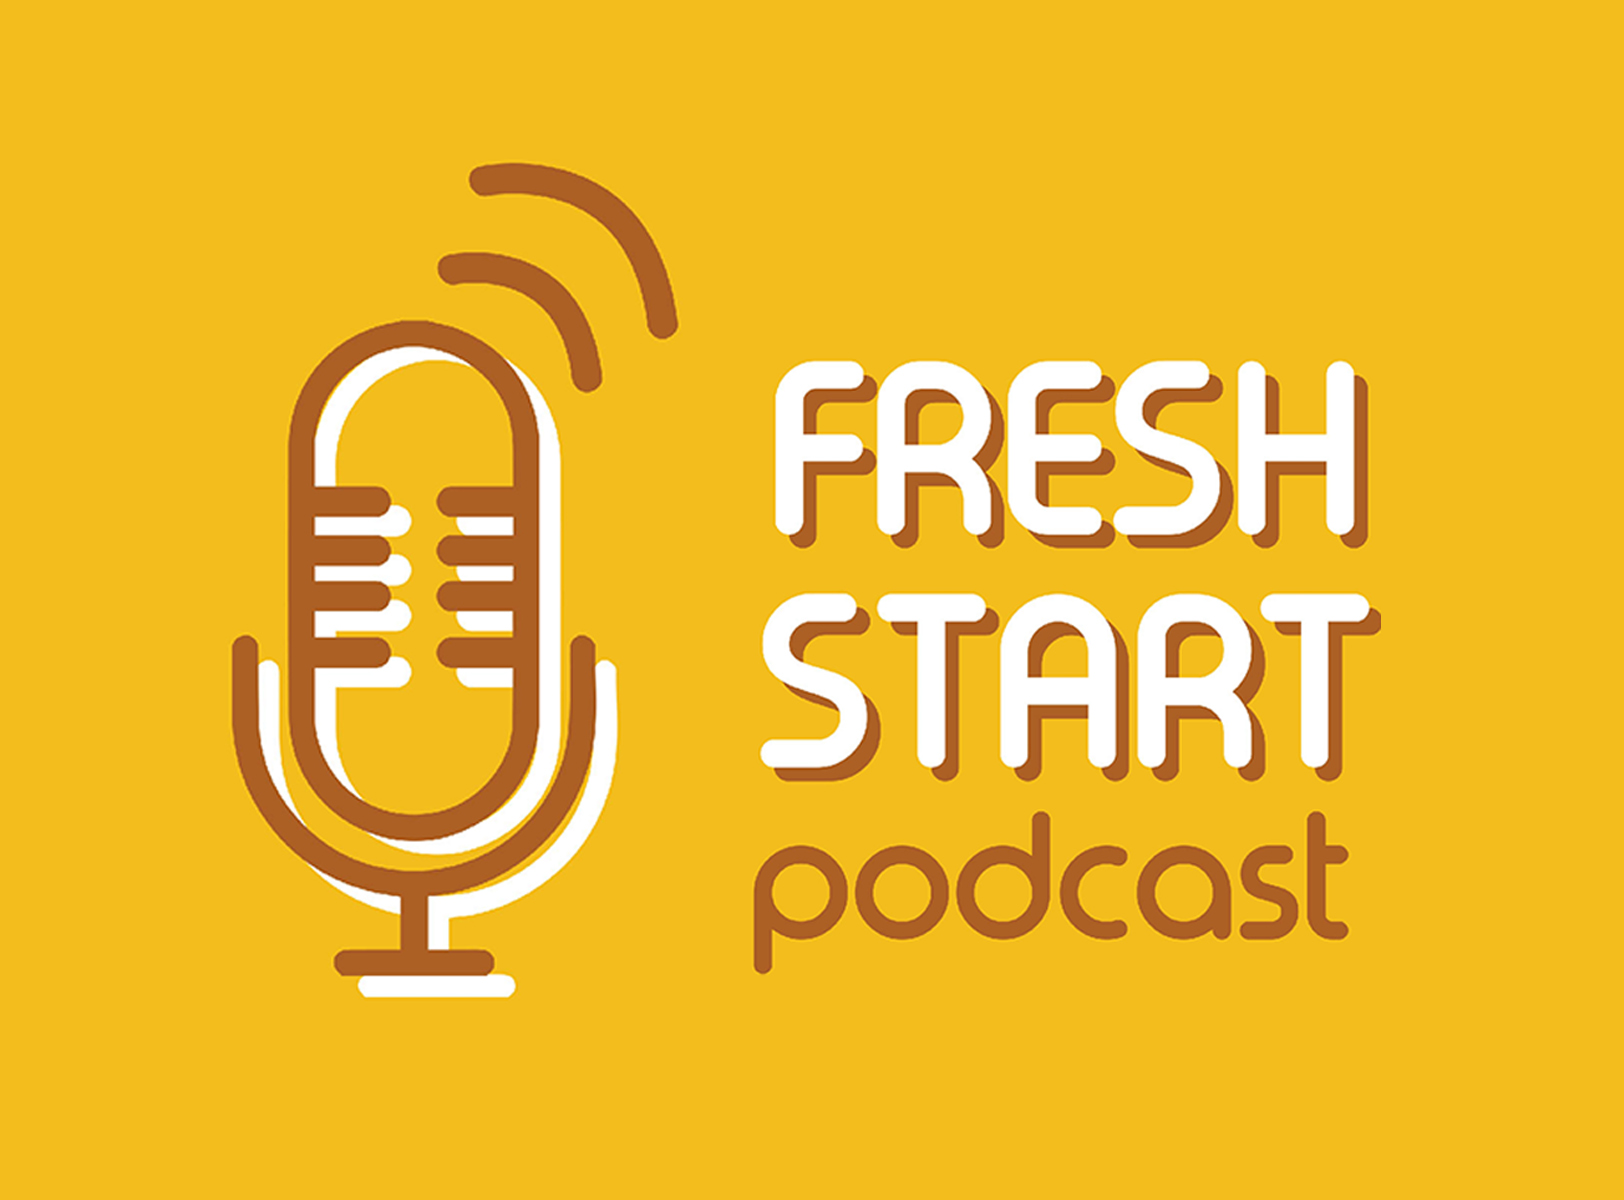 Fresh Start: Podcast News (11/20/2018 Tue.)